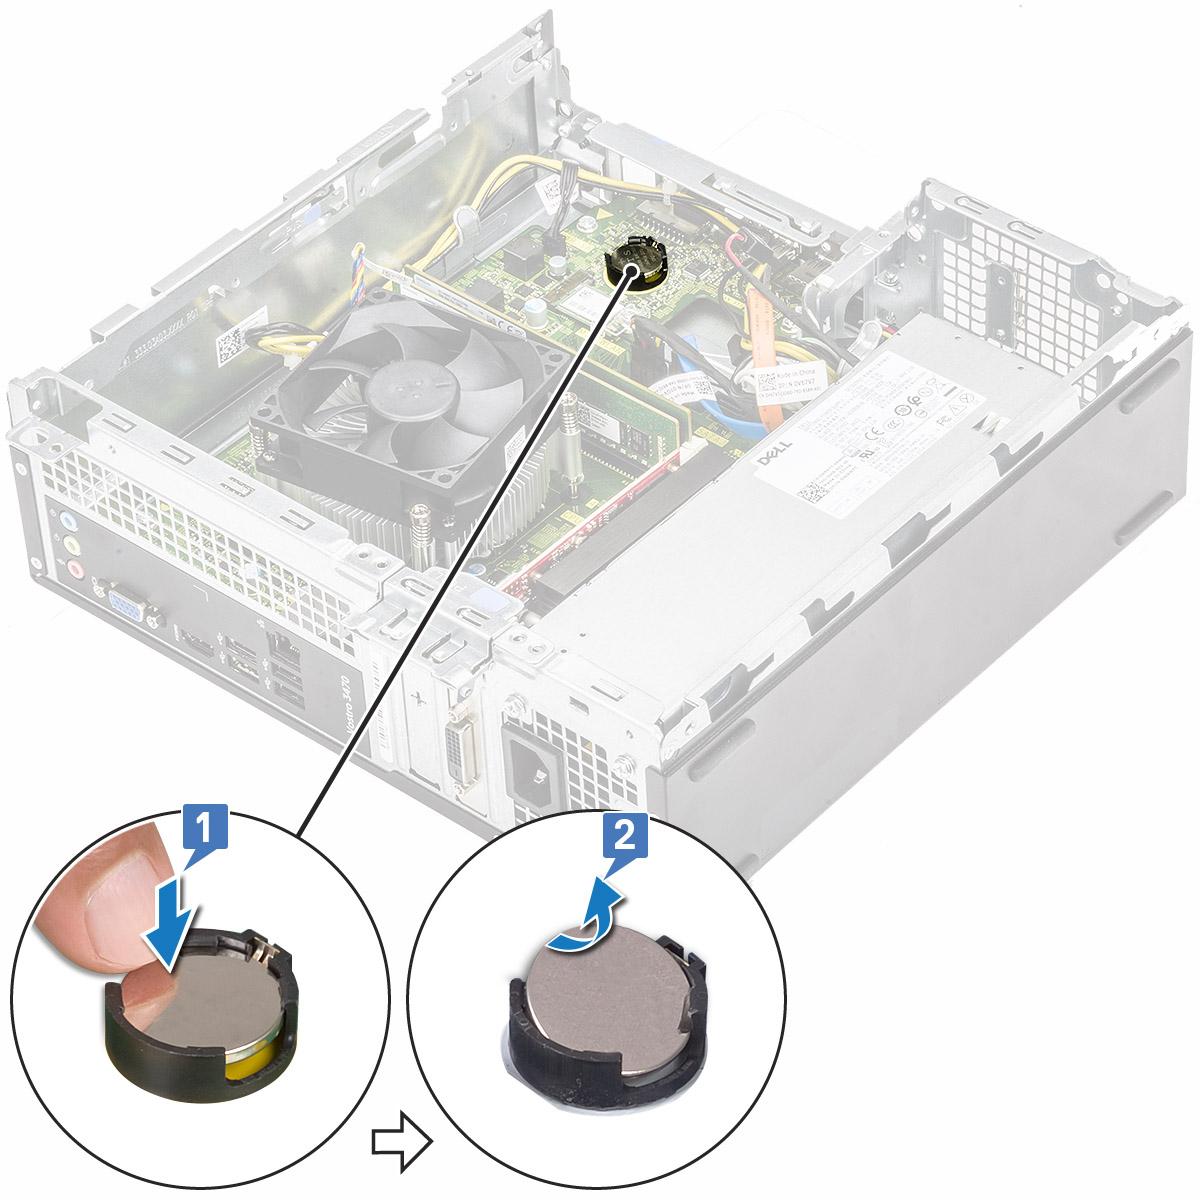 Gambar yang menampilkan pelepasan baterai sel berbentuk koin